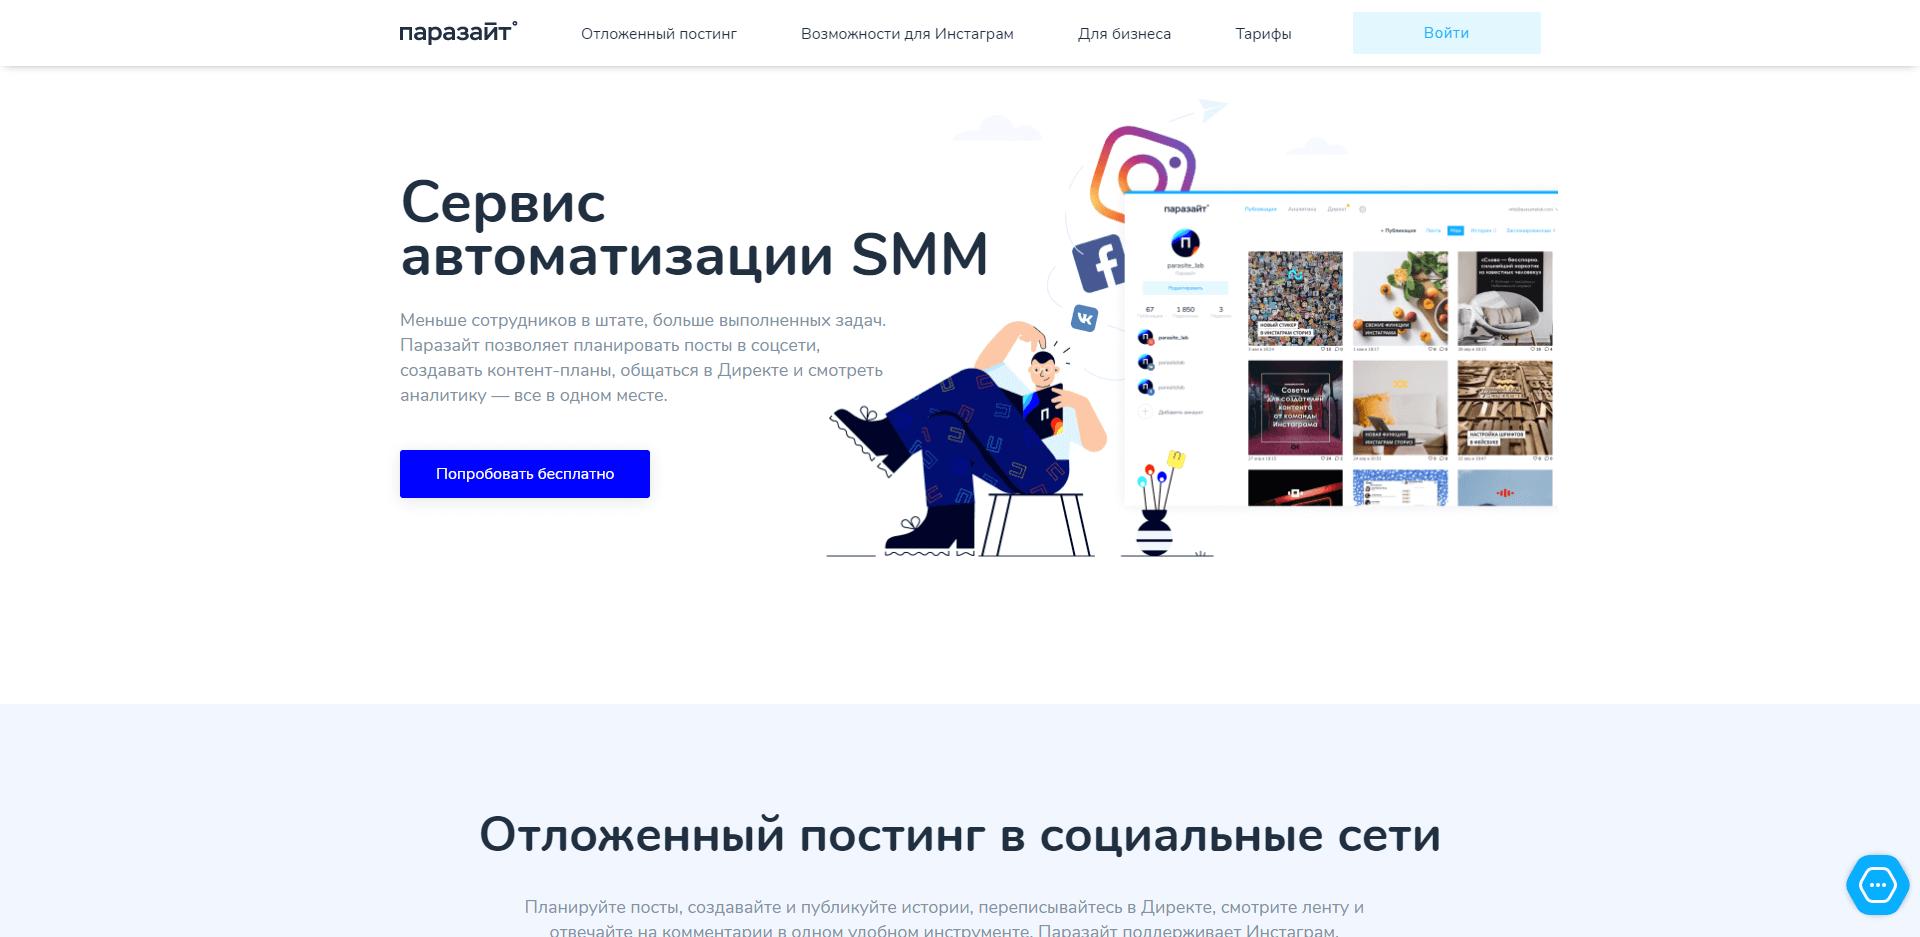 Сайт «Паразайт»